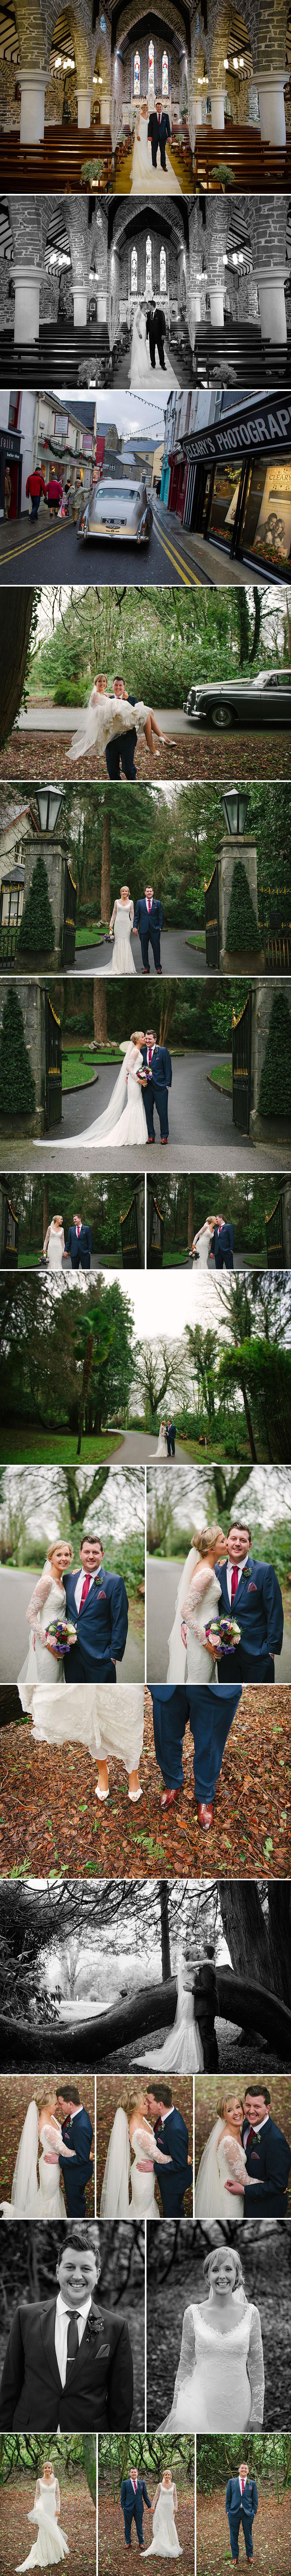 Ballyseede Castle Wedding (4)